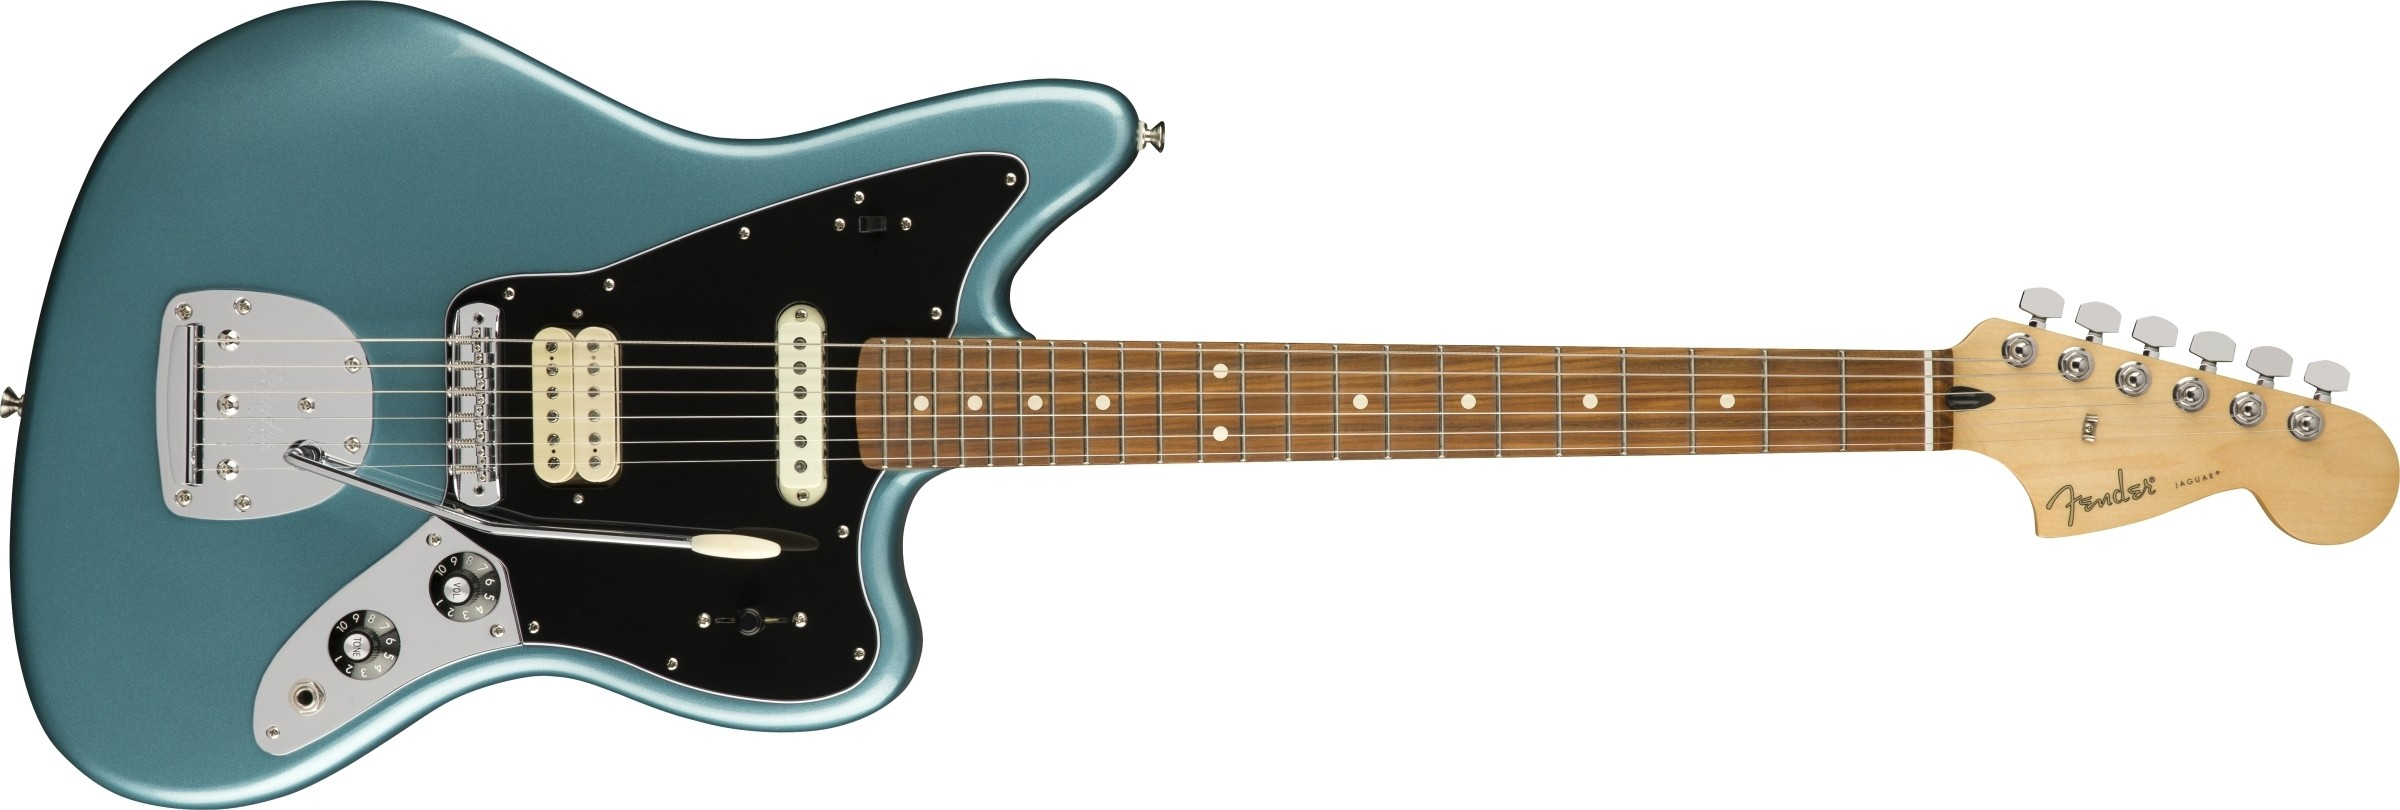 Fender Player Jaguar - Tidepool